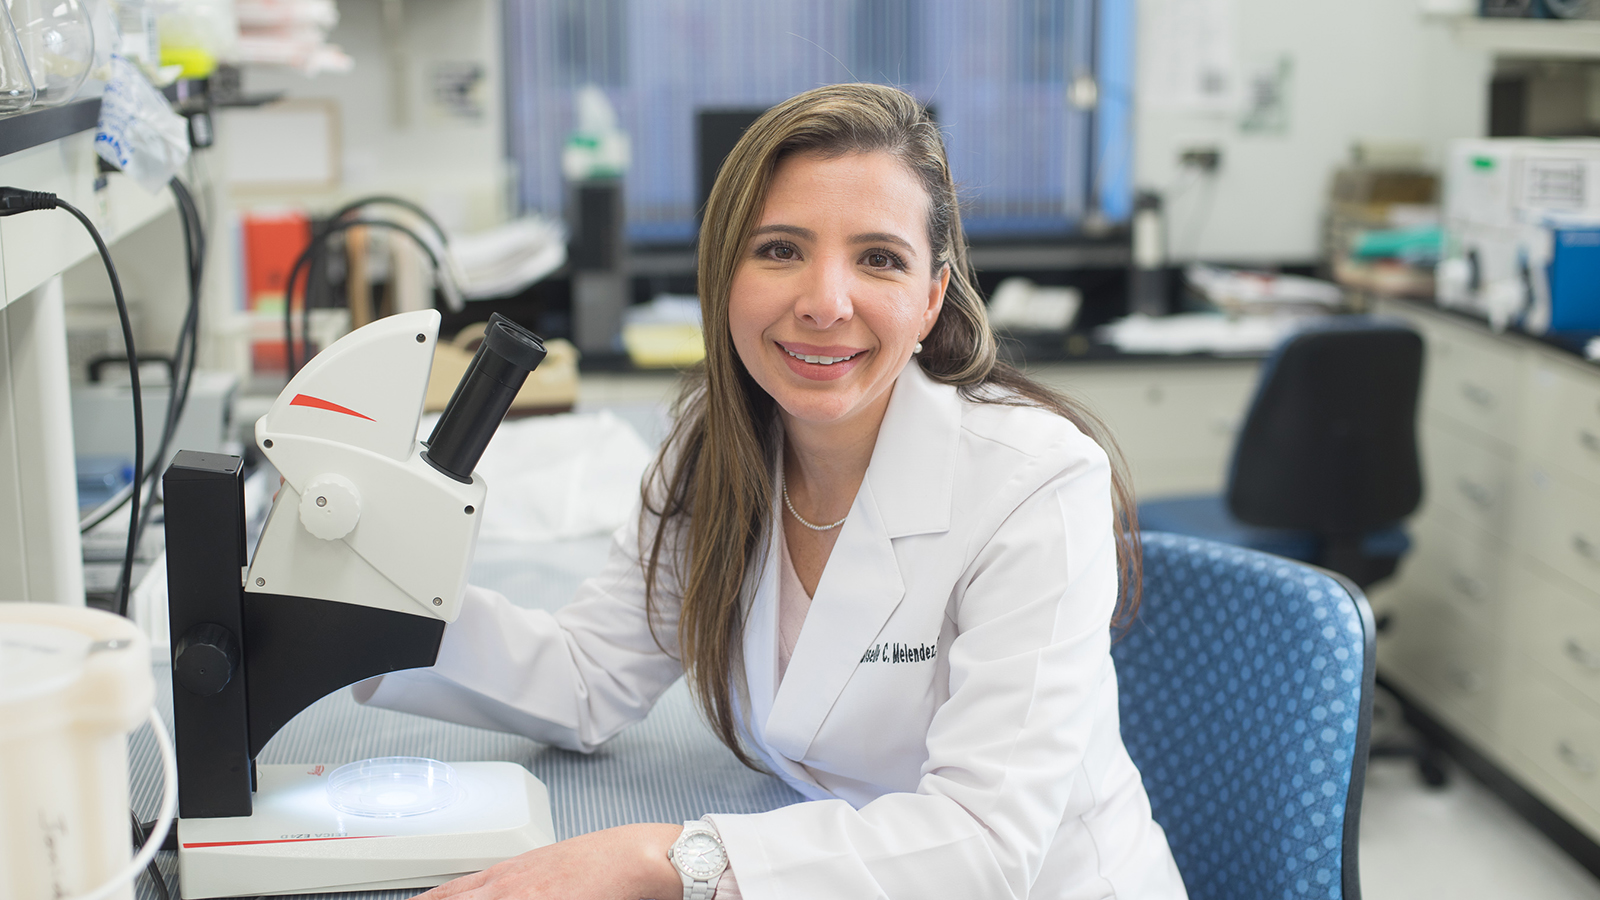 Giselle Meléndez, MD